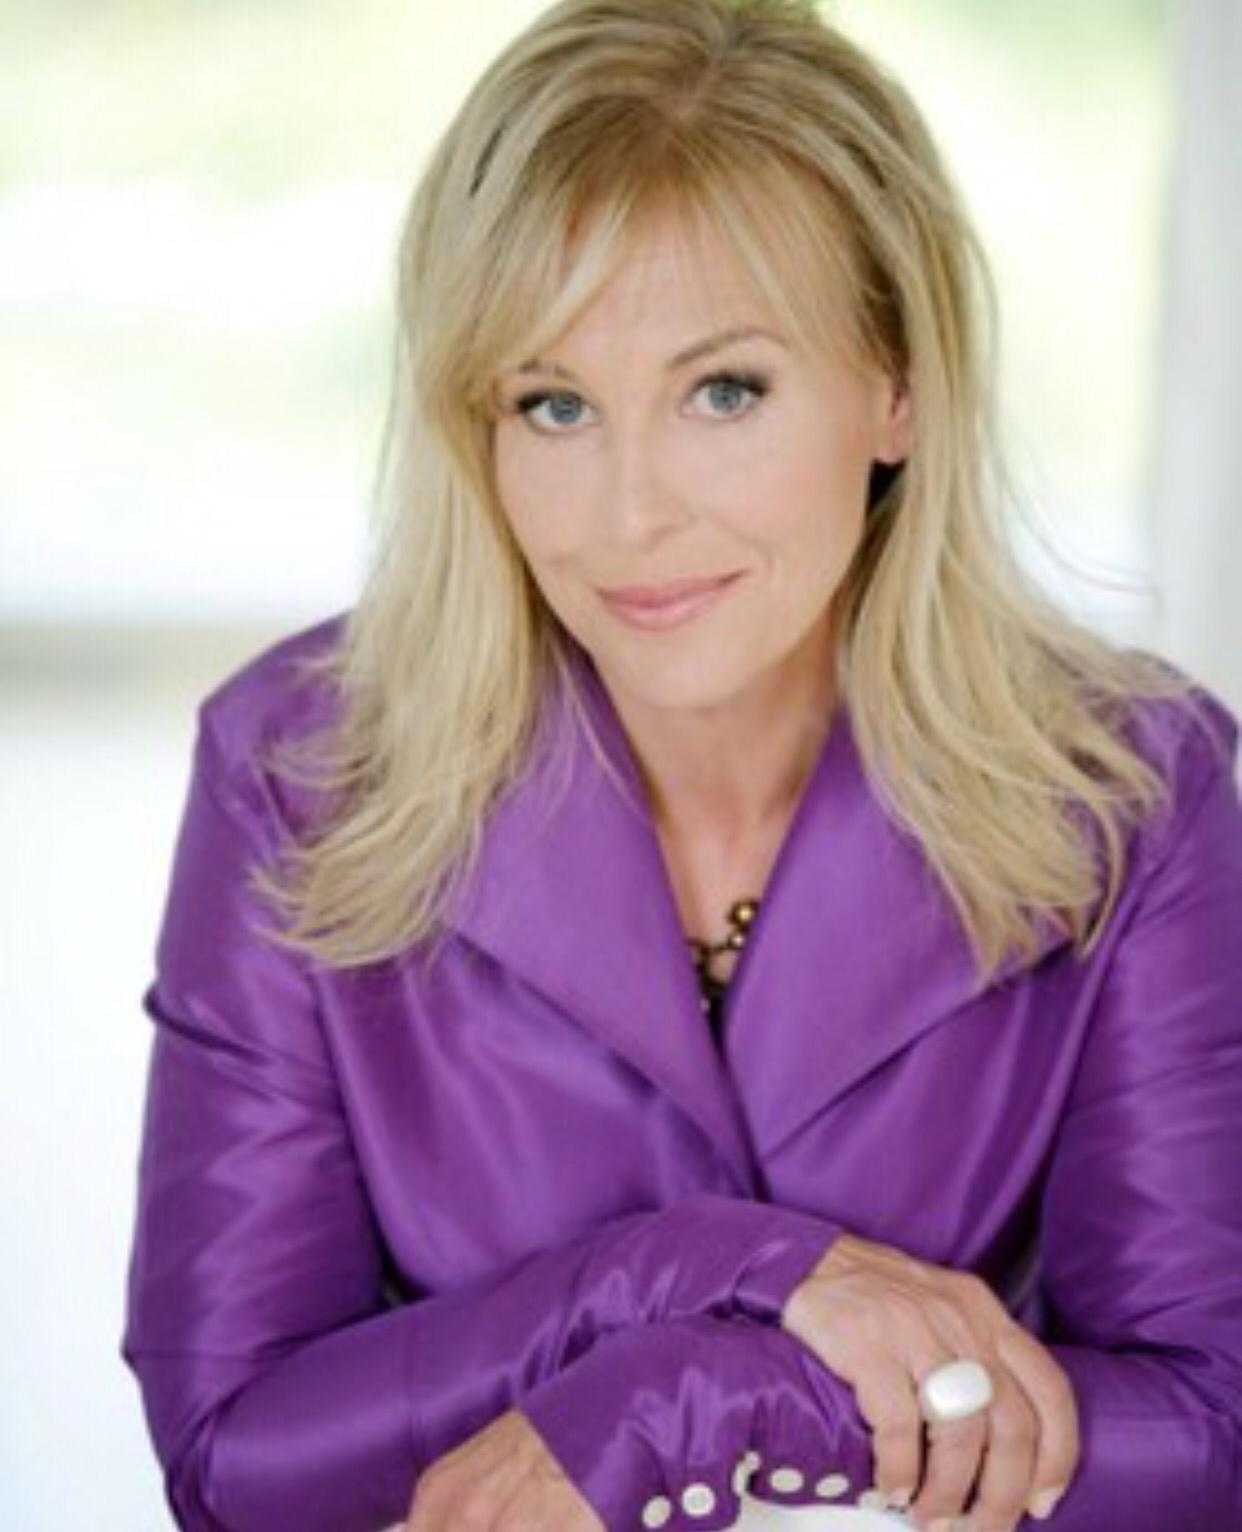 pictures Nicole Barber-Lane (born 1972)